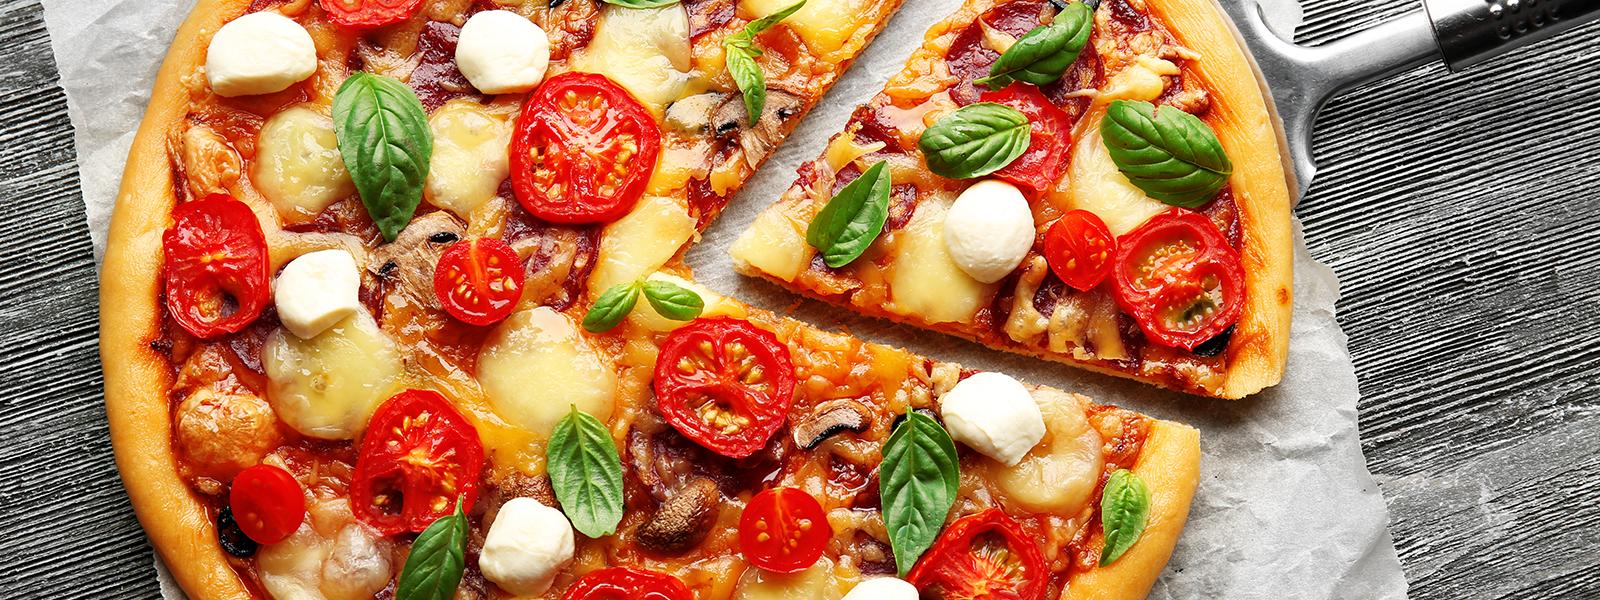 Wrose Pizza Kings Balti Wrose Pizza Kings Balti